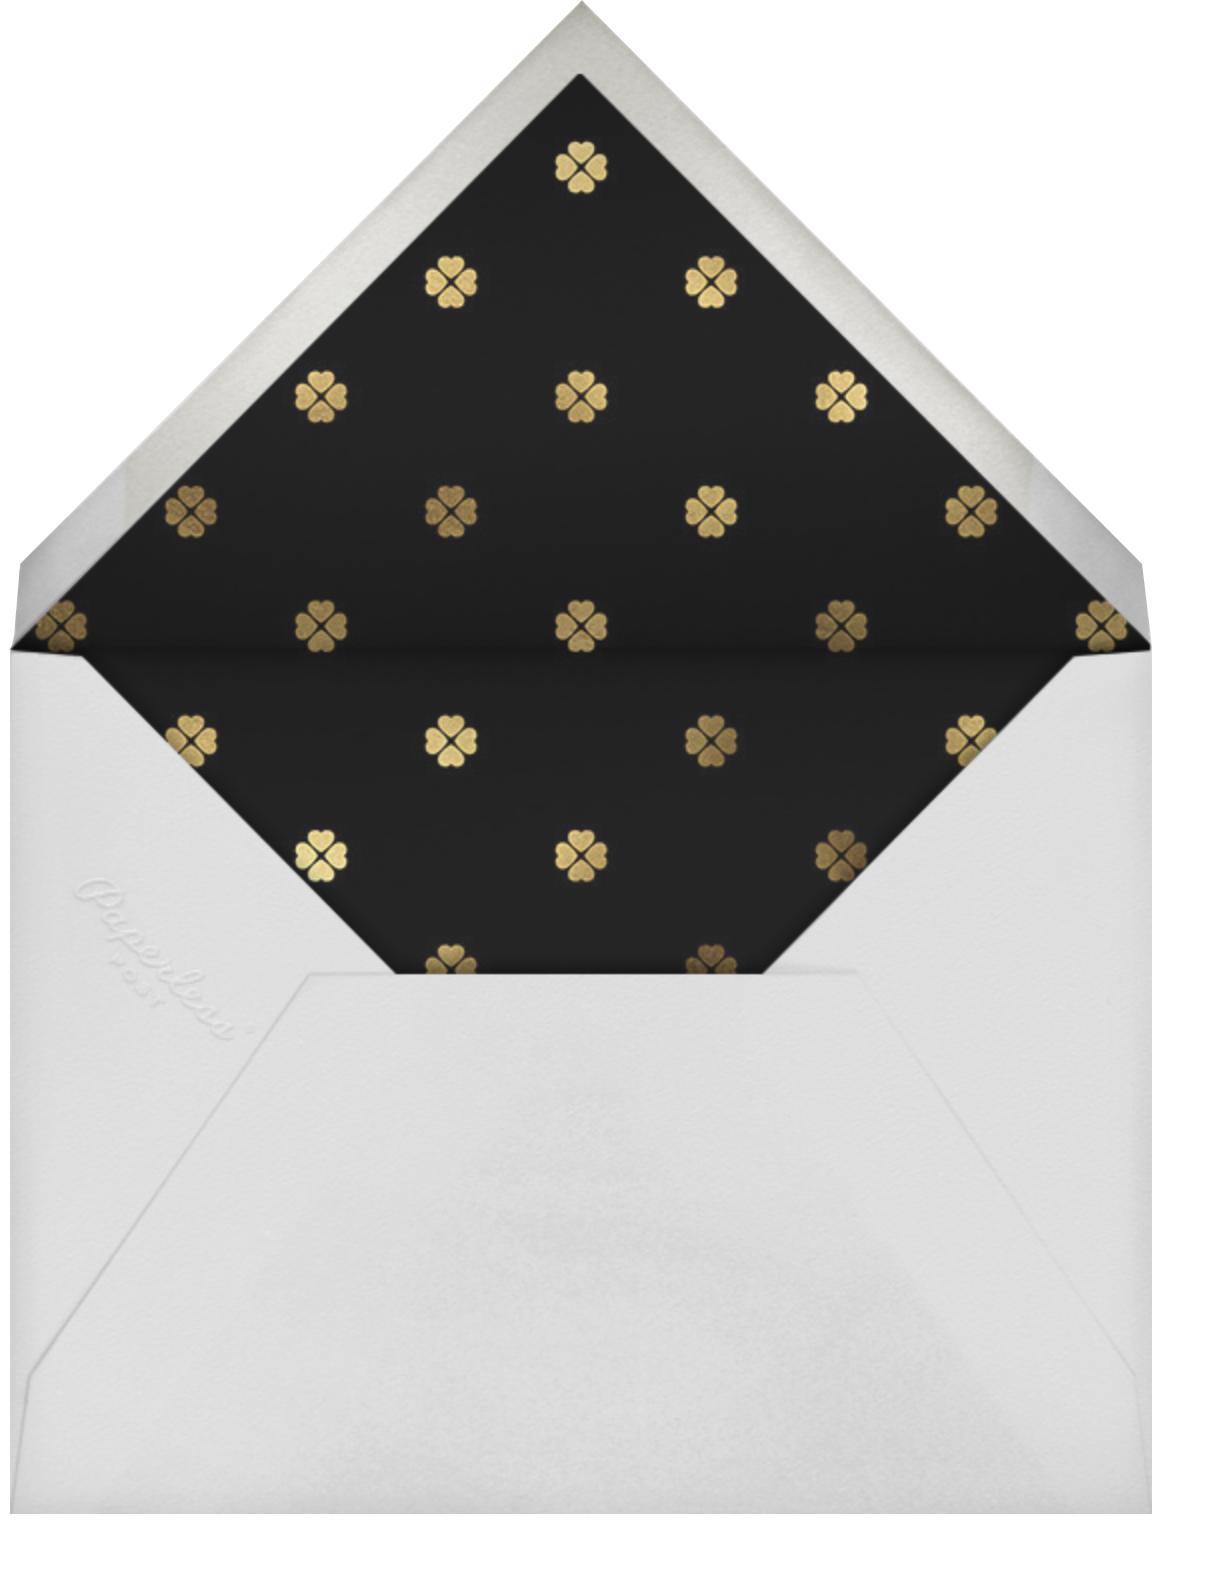 Colorblocked Stripes - Black/Rose - kate spade new york - Adult birthday - envelope back